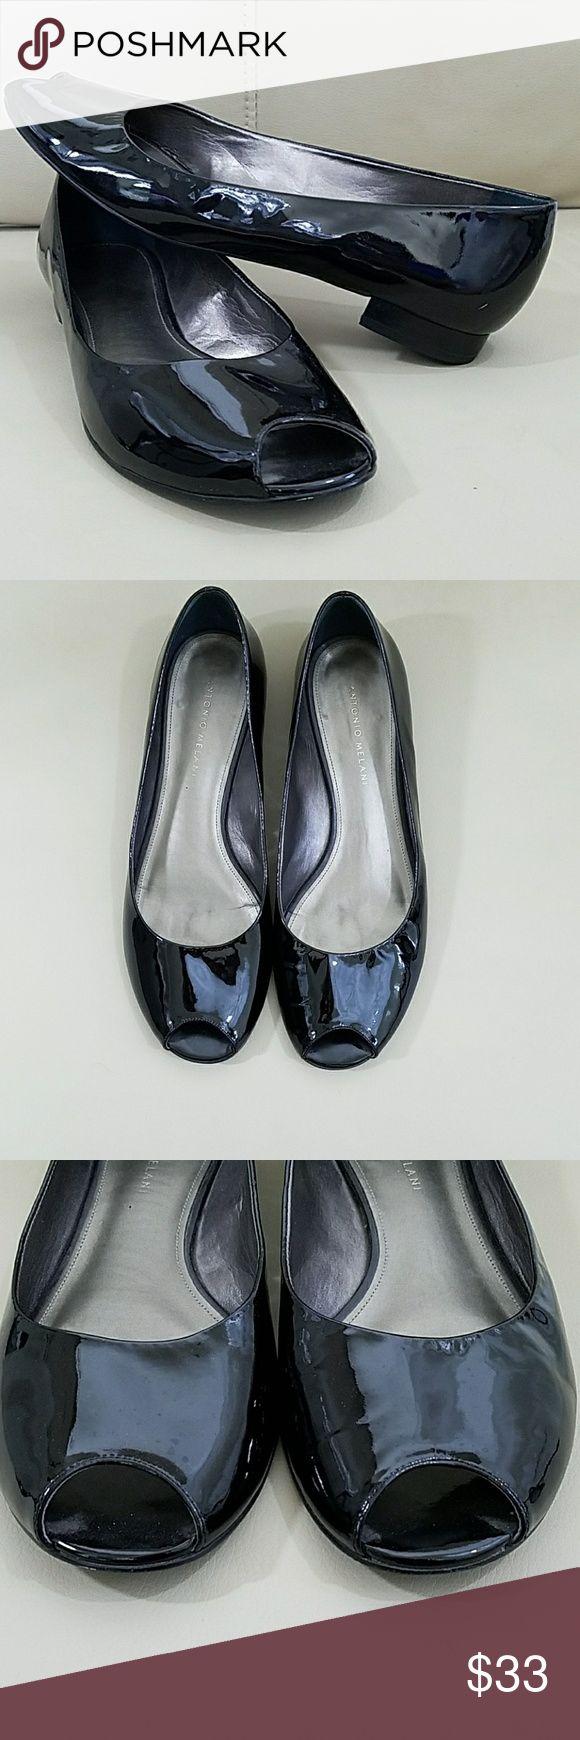 ANTONIO MELANI 0.25 heel Sz 9.5M ANTONIO MELANI Shoes Flats & Loafers